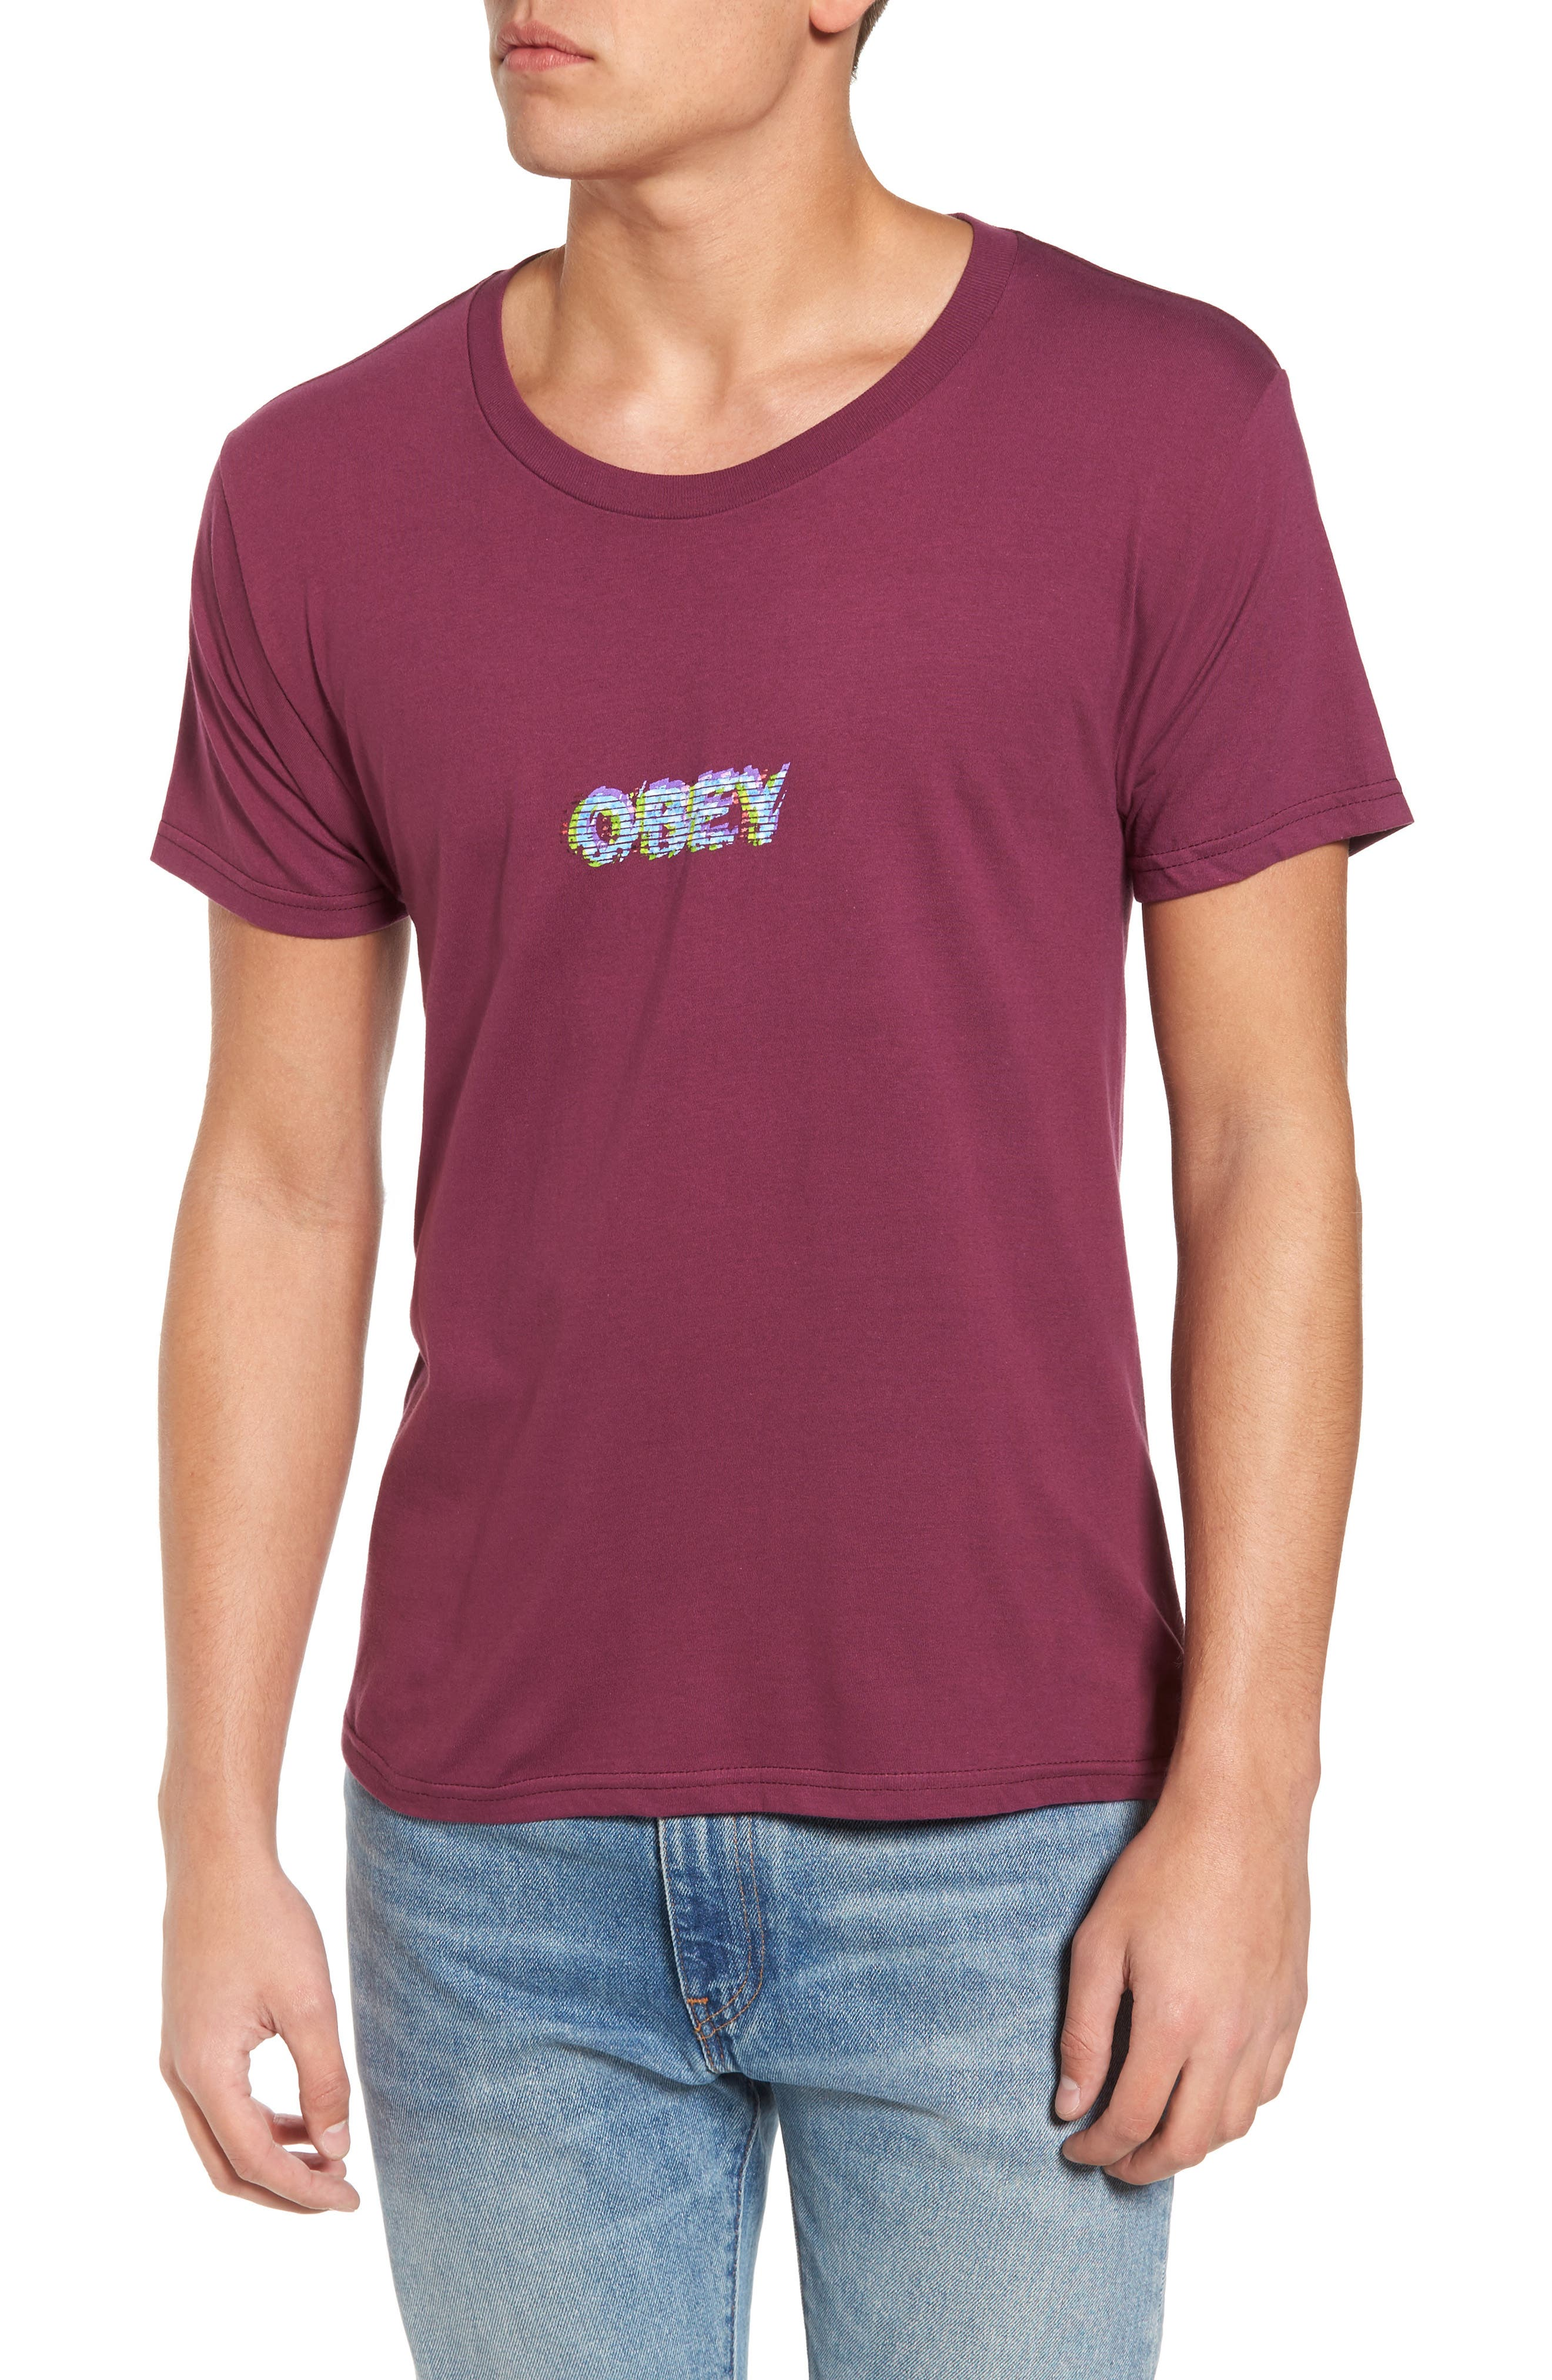 Main Image - Obey Creep Scan T-Shirt